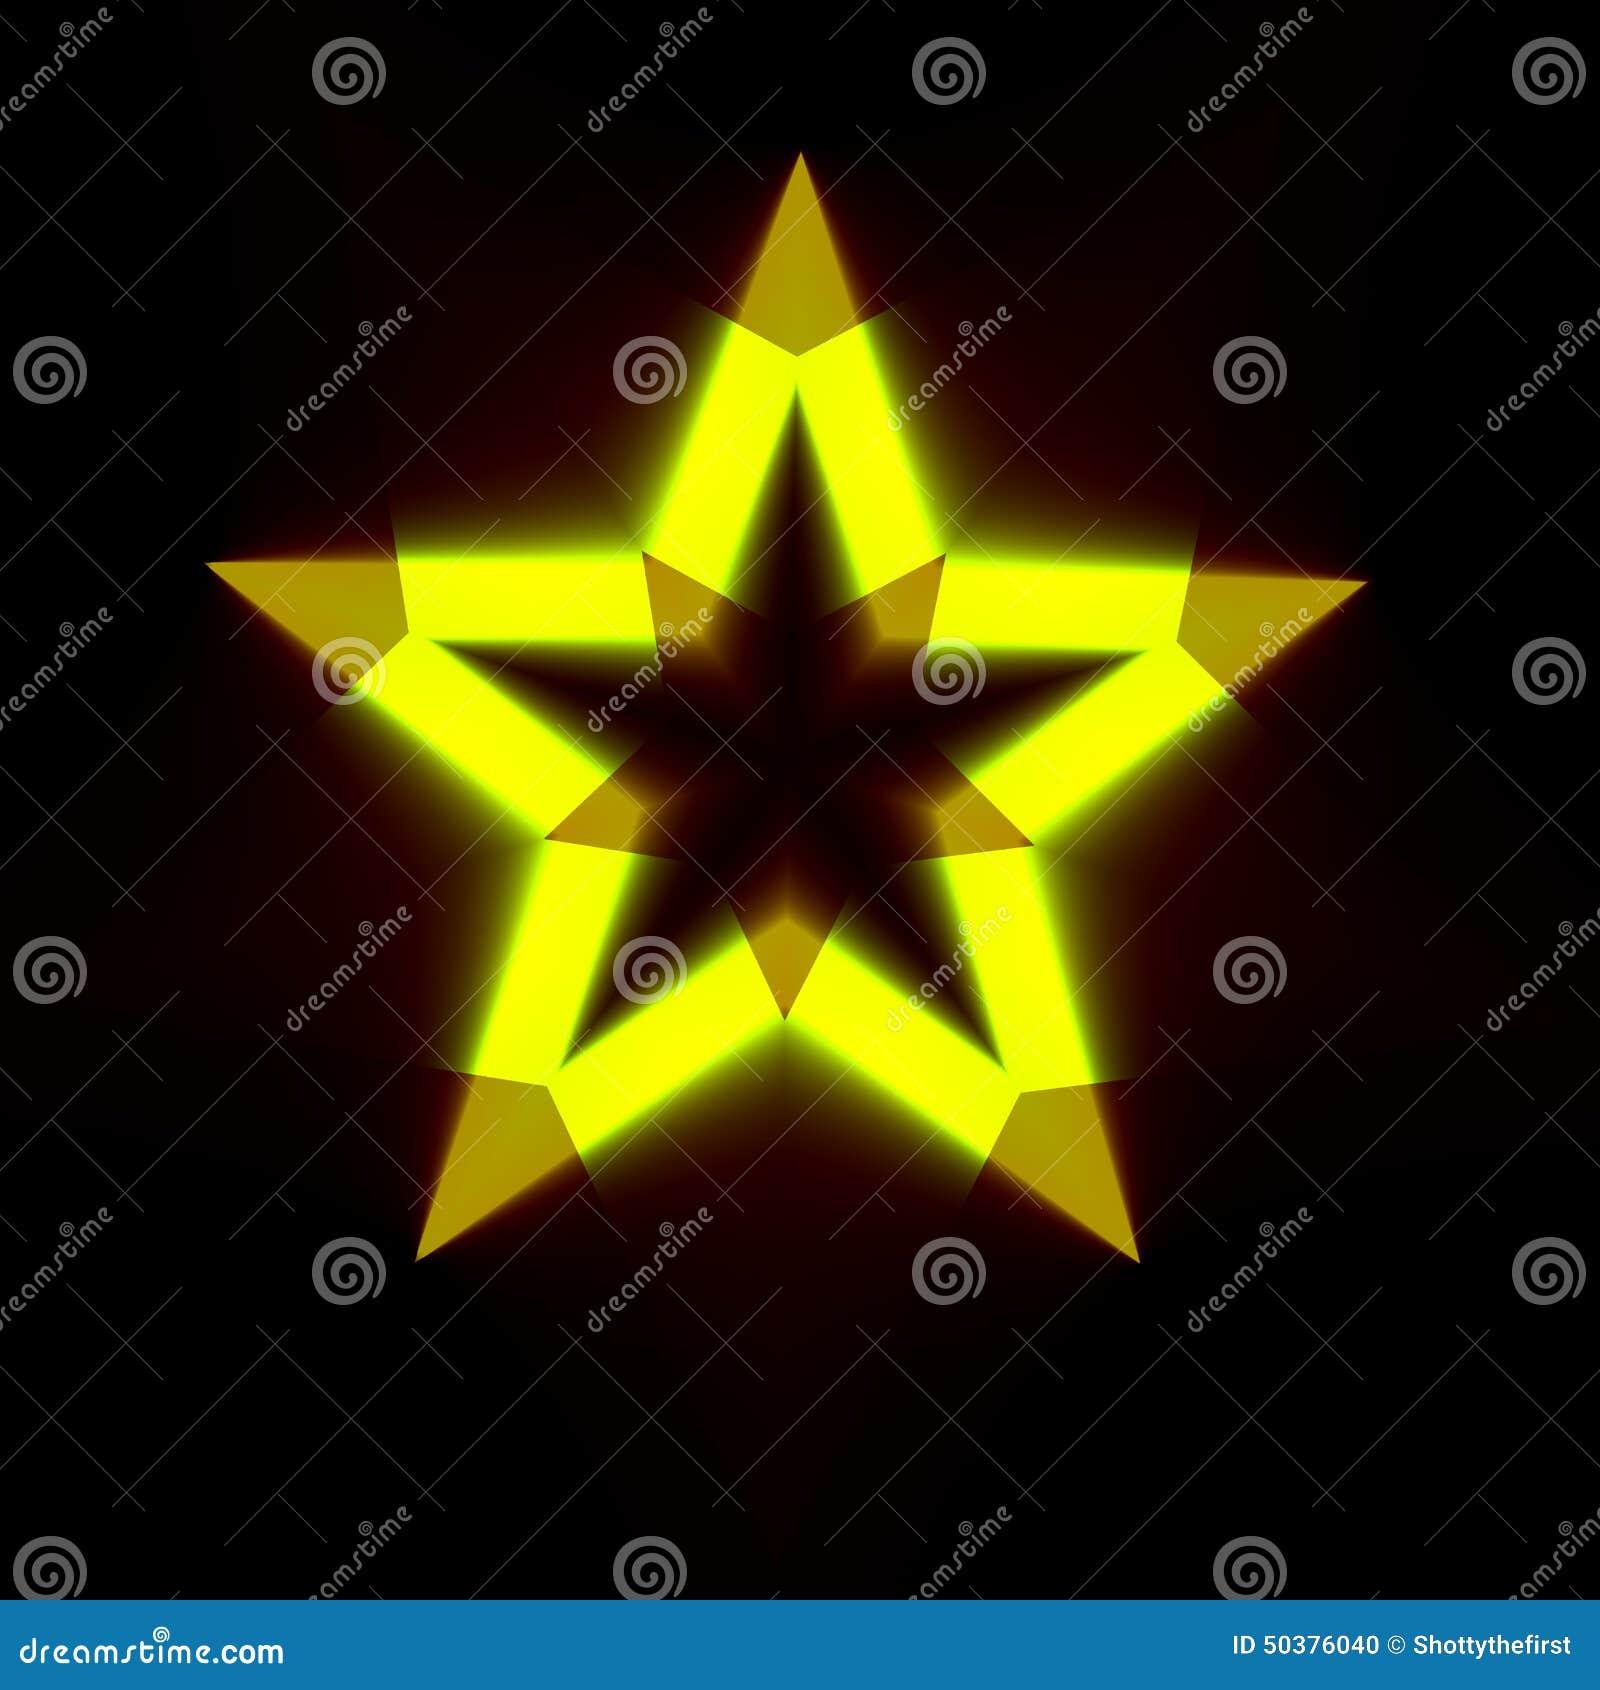 Abstract Black Background With Light Star Shape. Dark Digital ...